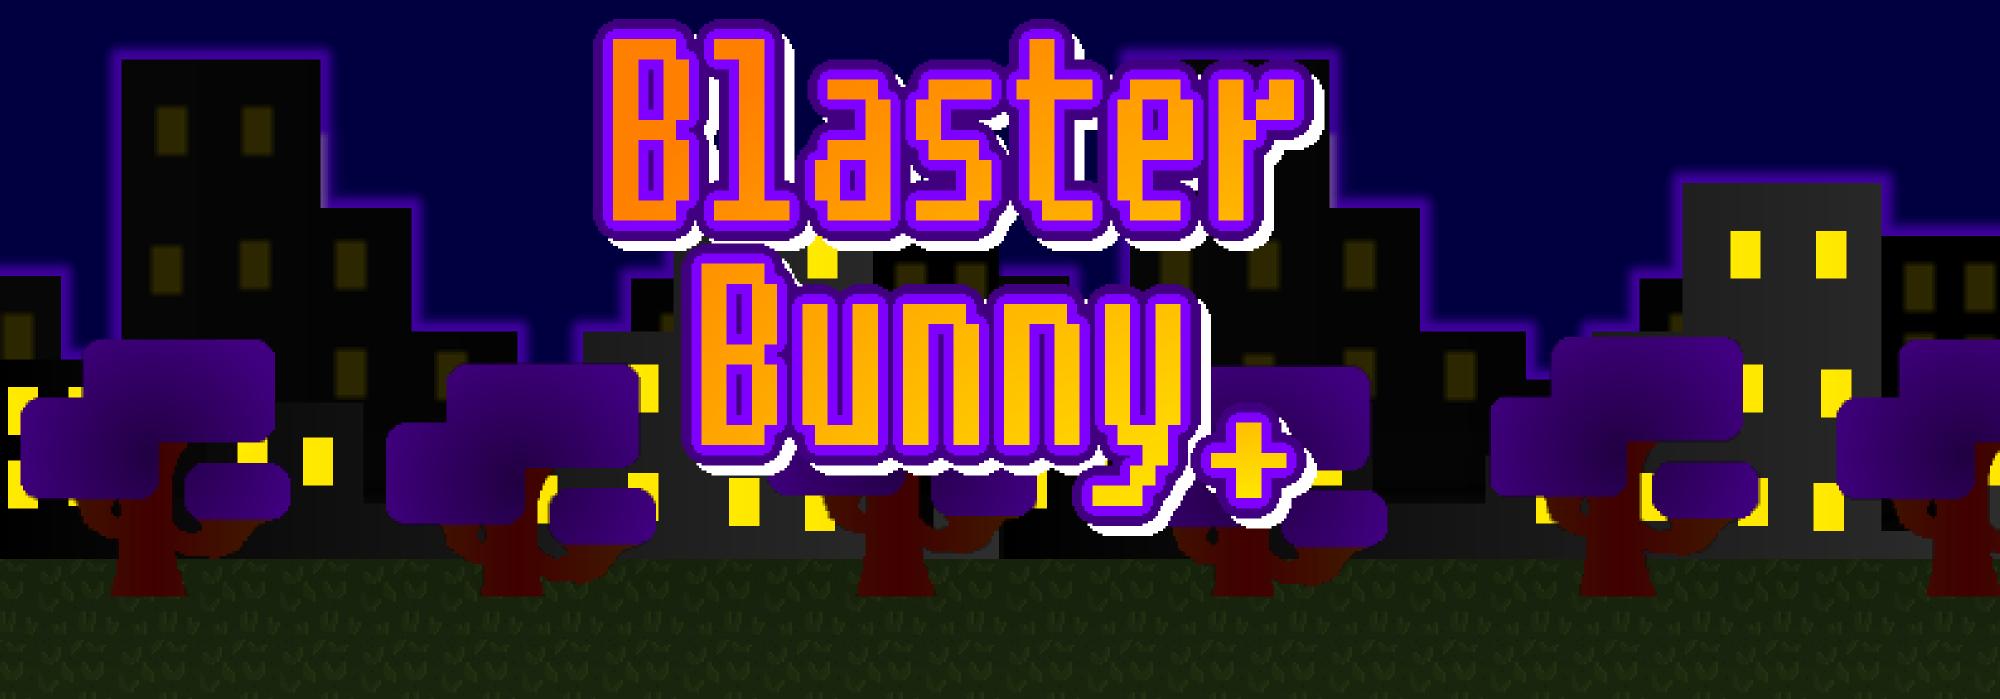 Blaster Bunny +